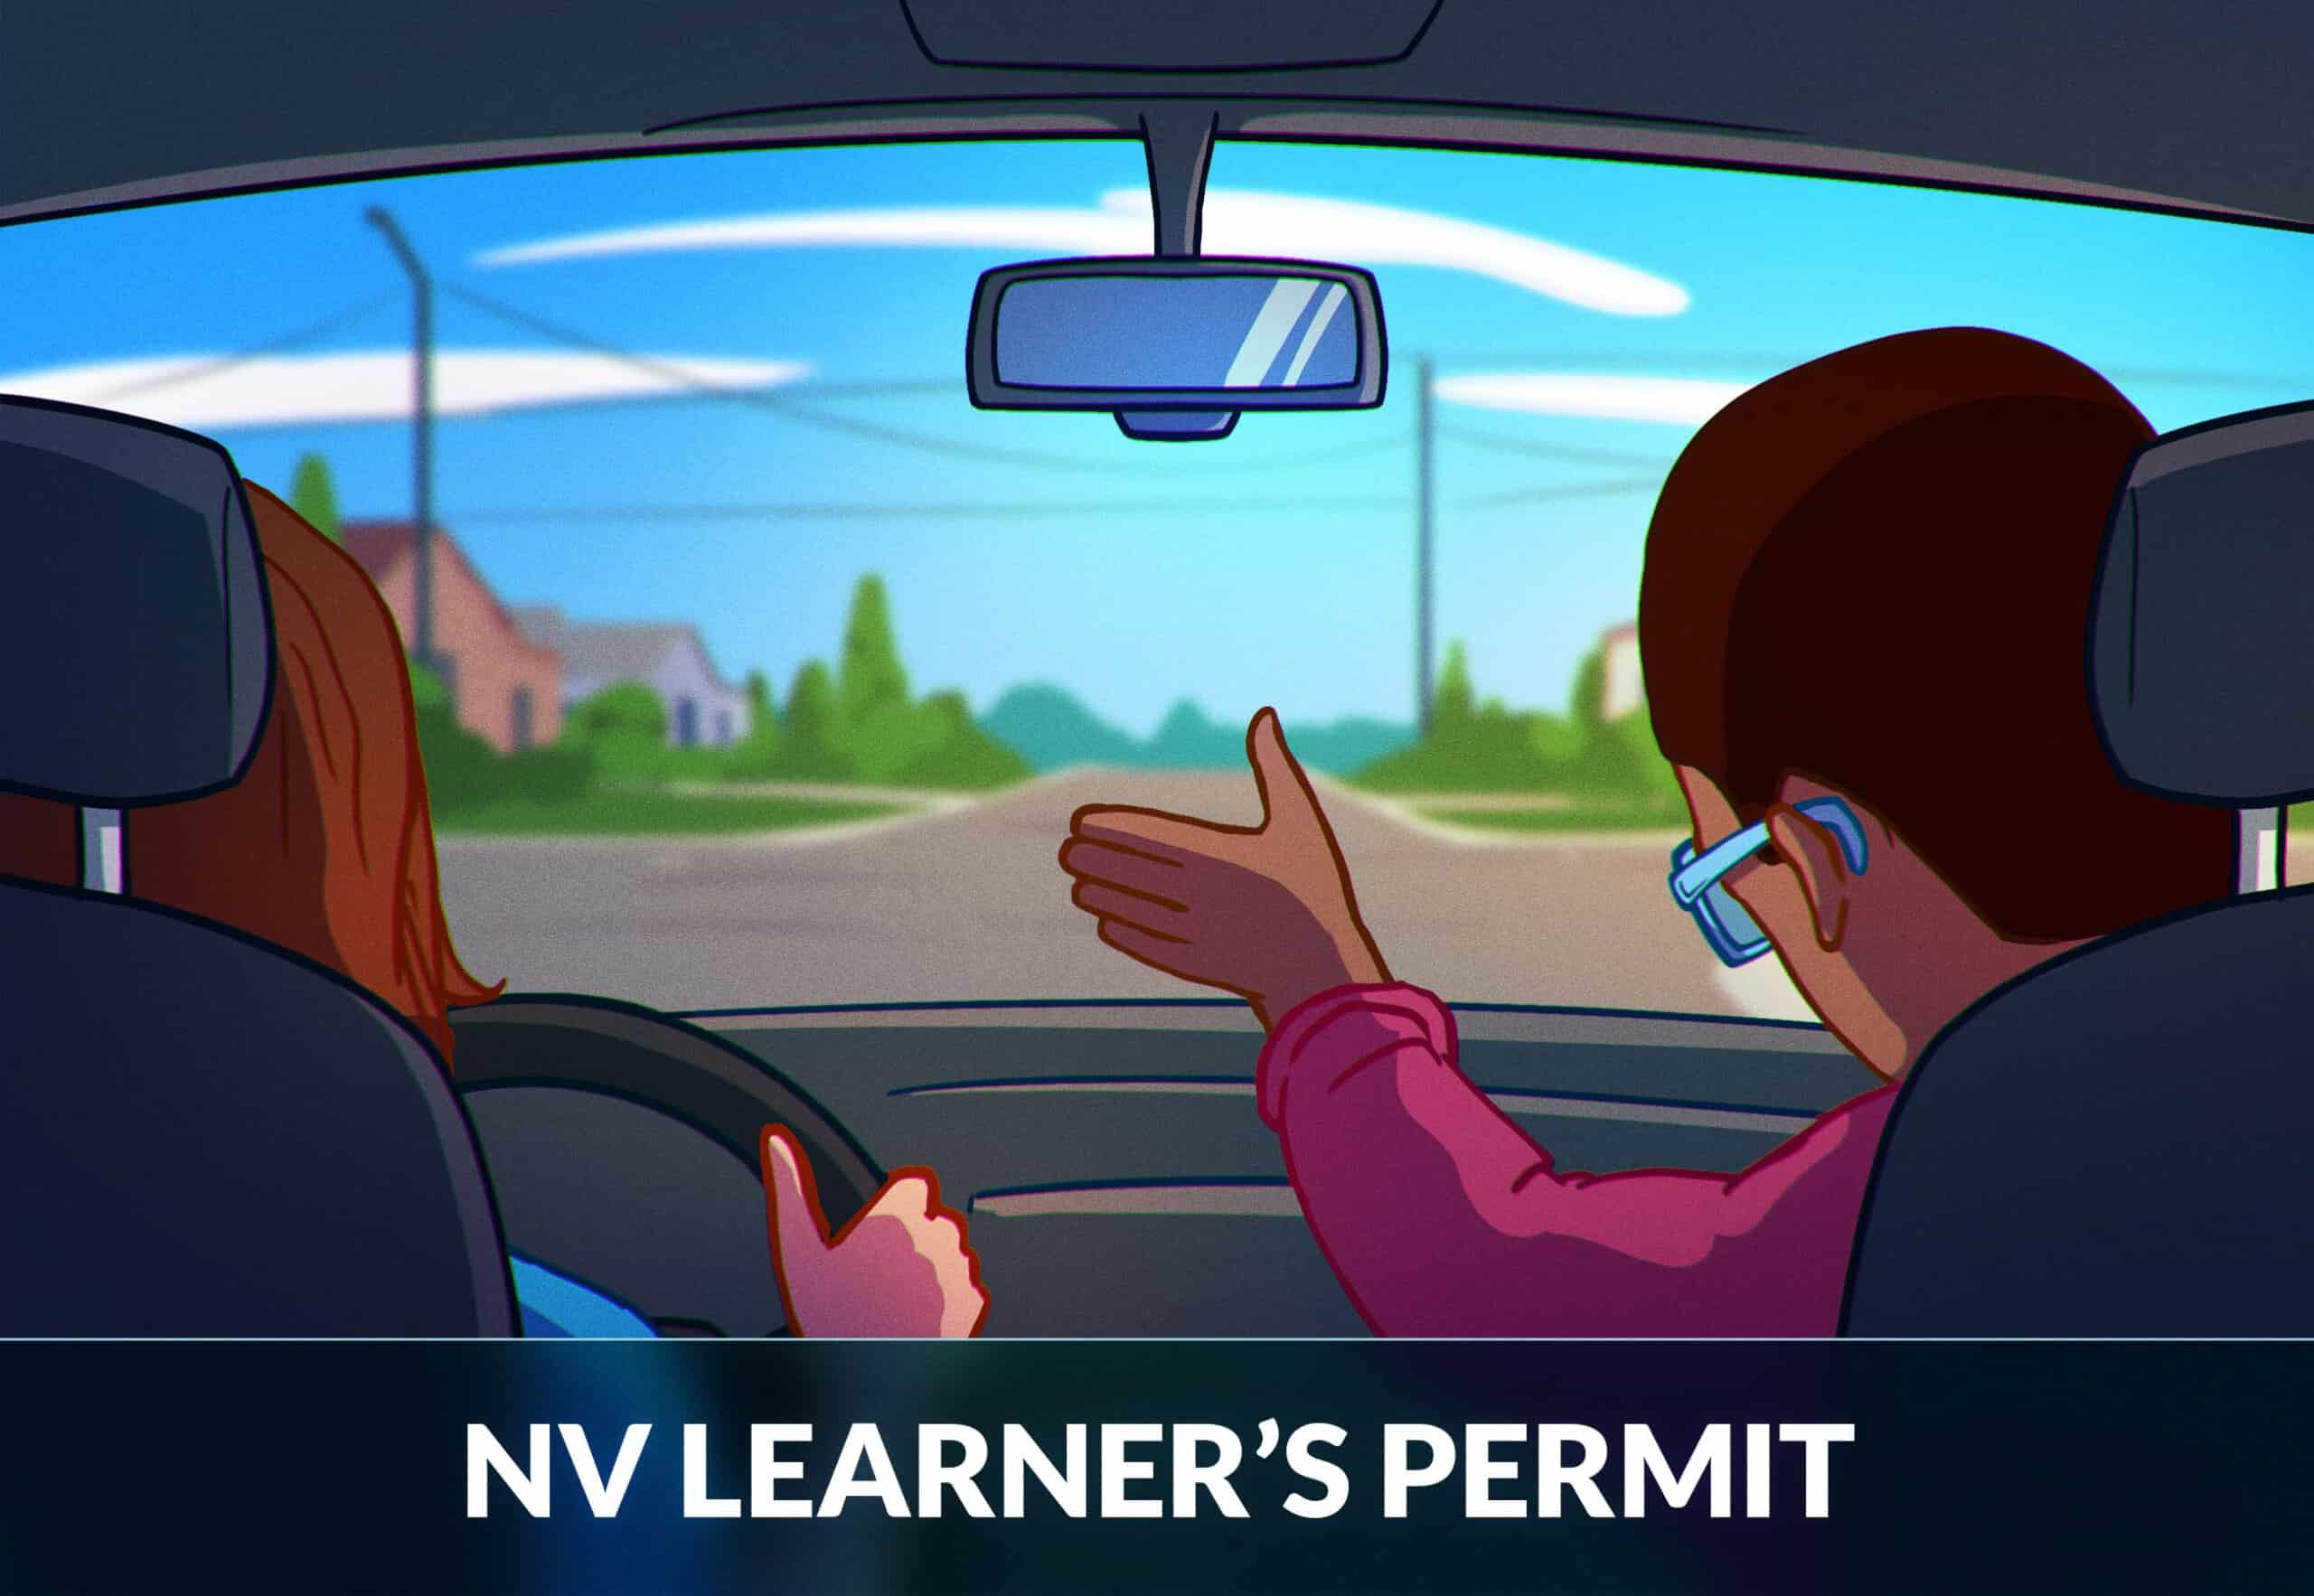 Nevada learners permit